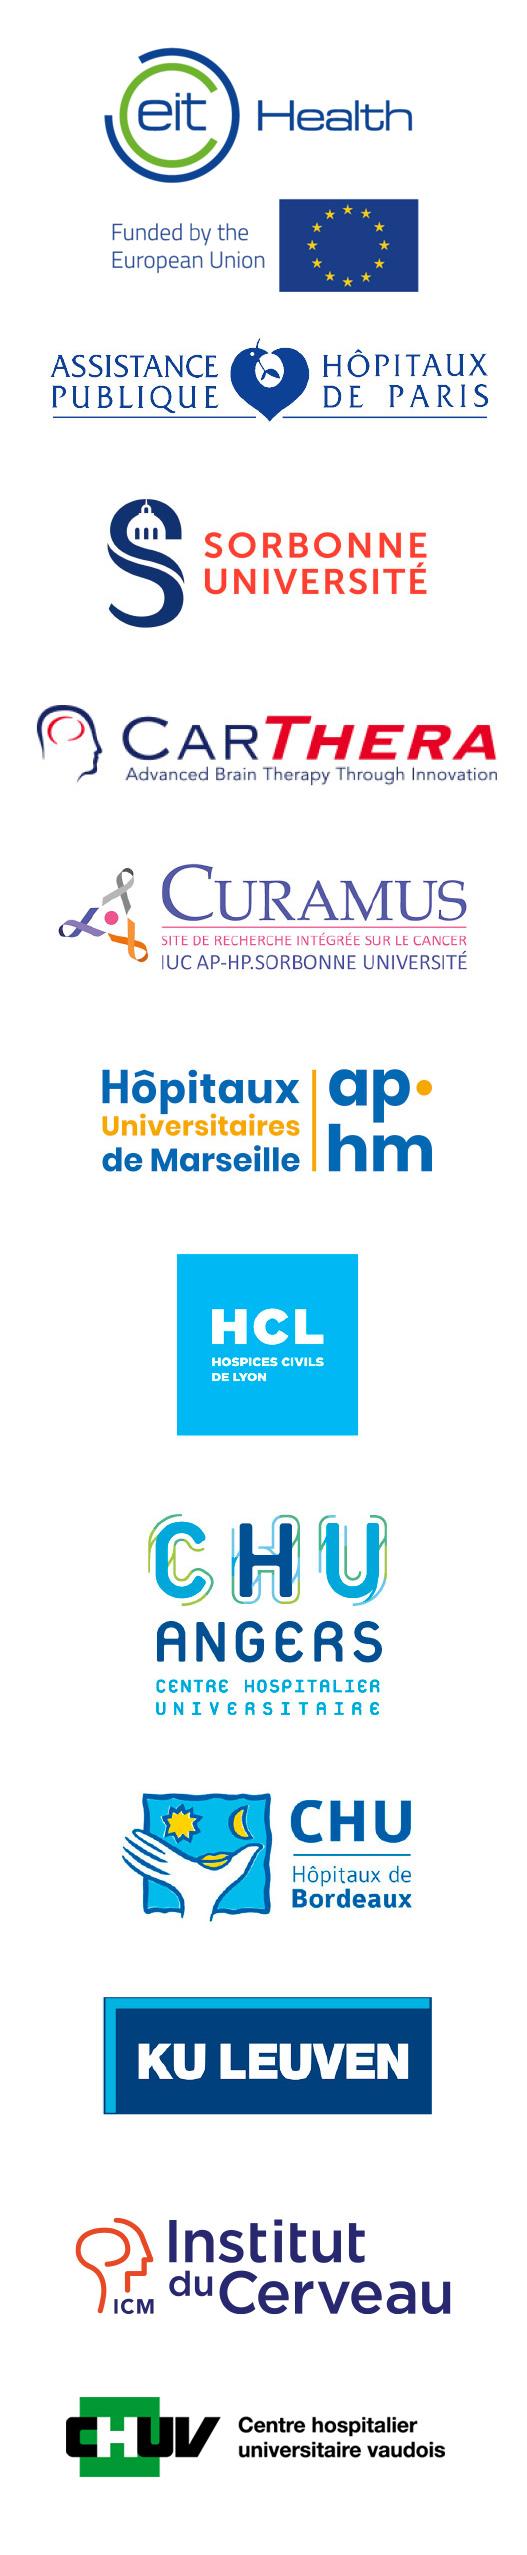 SonoFirst Partners - APHP- Sorbonne U - CarThera - Curamus - Aphm -HCL -CHu Angers - Chu Bordeaux - ICM -Ku Leuven - CHUV